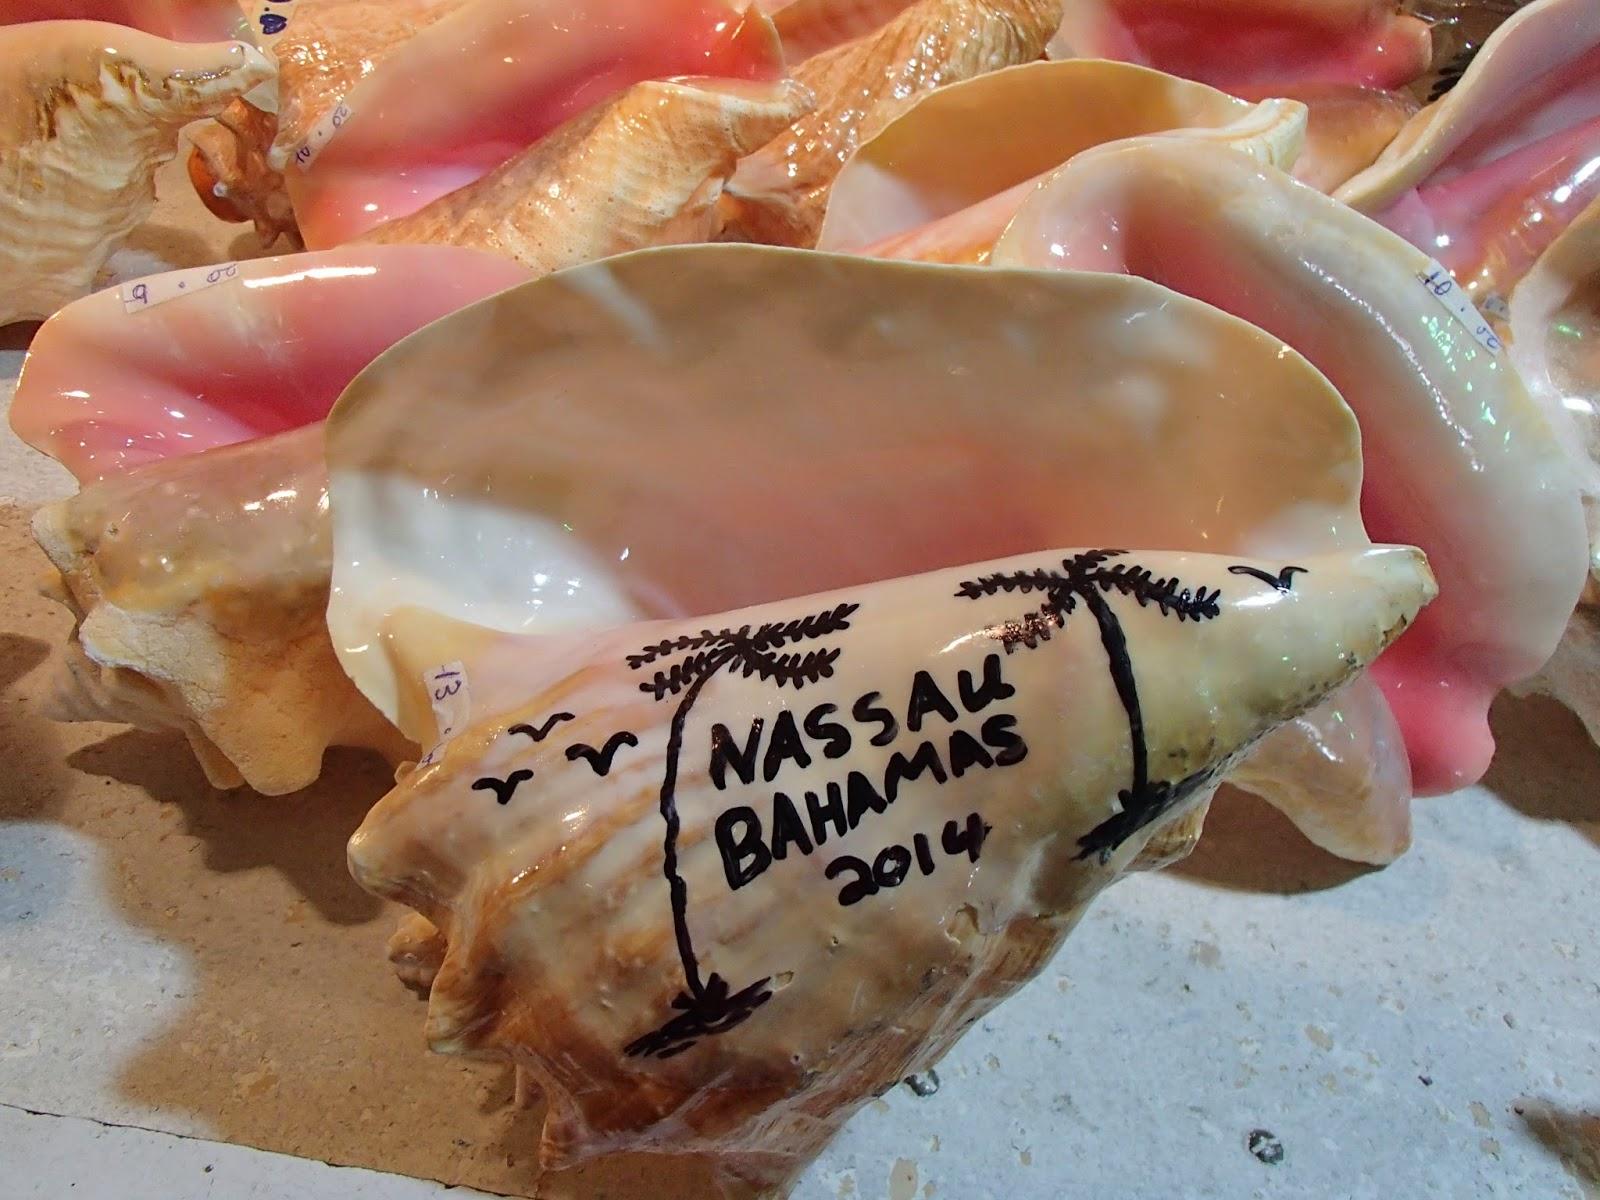 Nassau conch shells